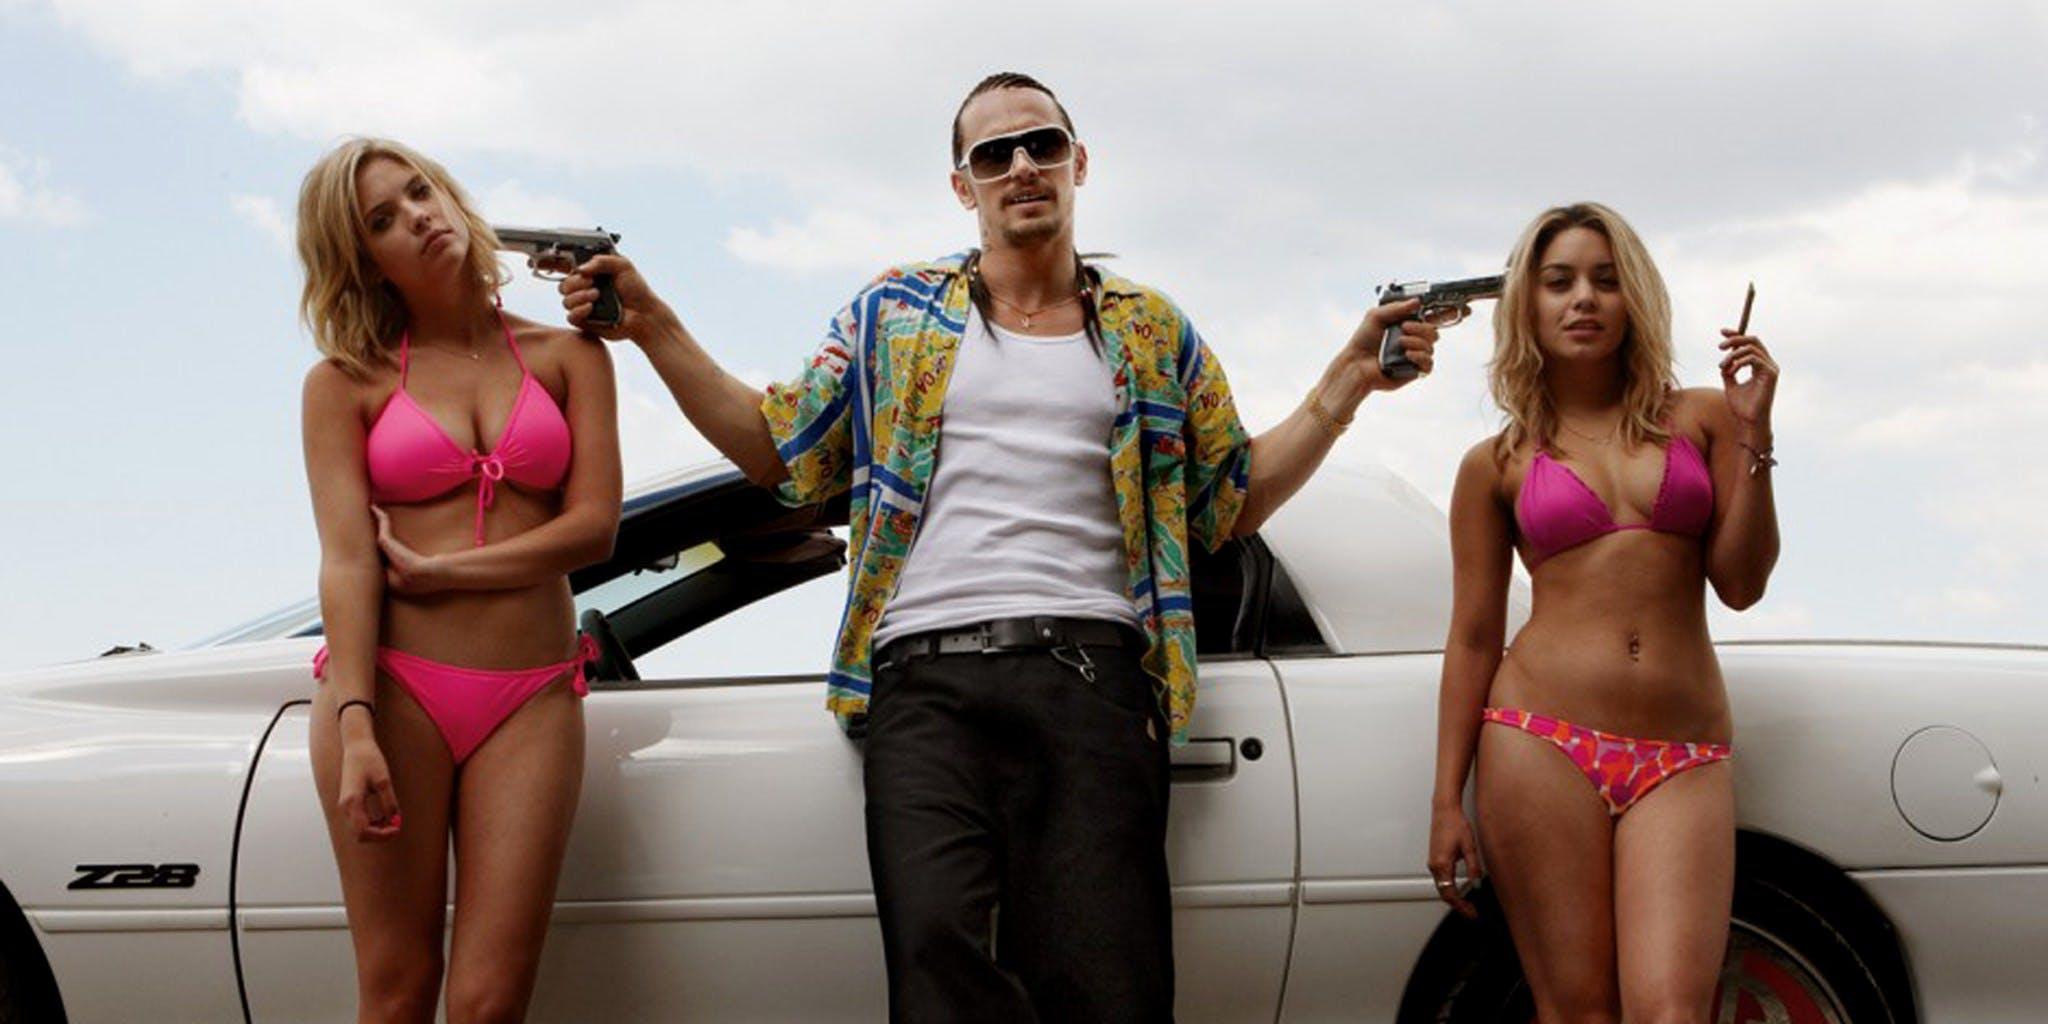 best movies on Netflix: Spring Breakers